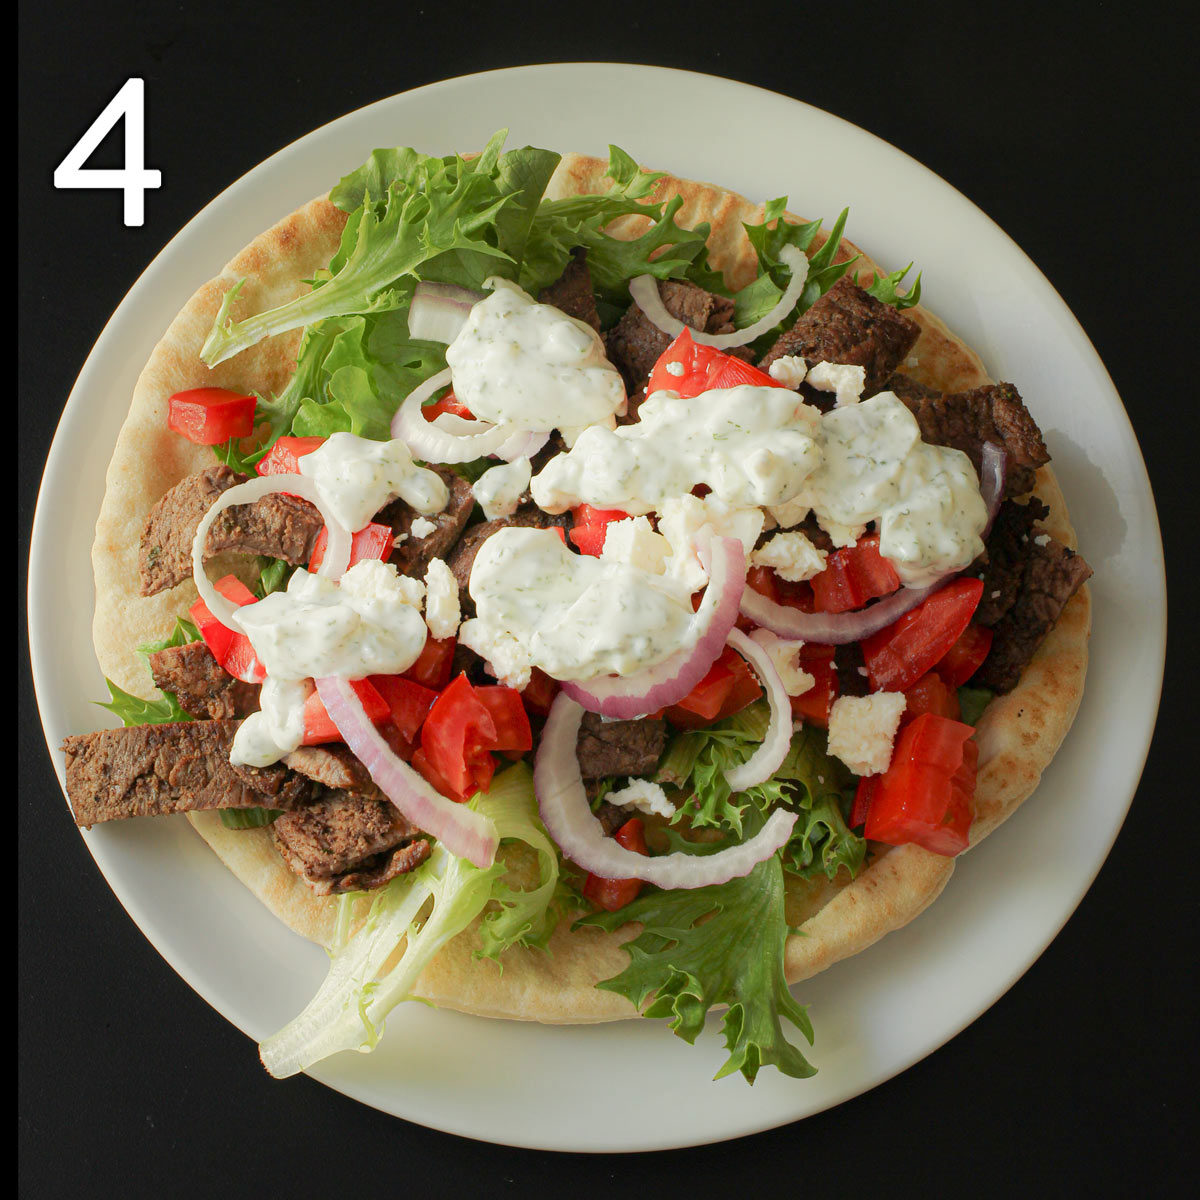 a pita round piled with steak, vegetables, feta, and tzatziki sauce.